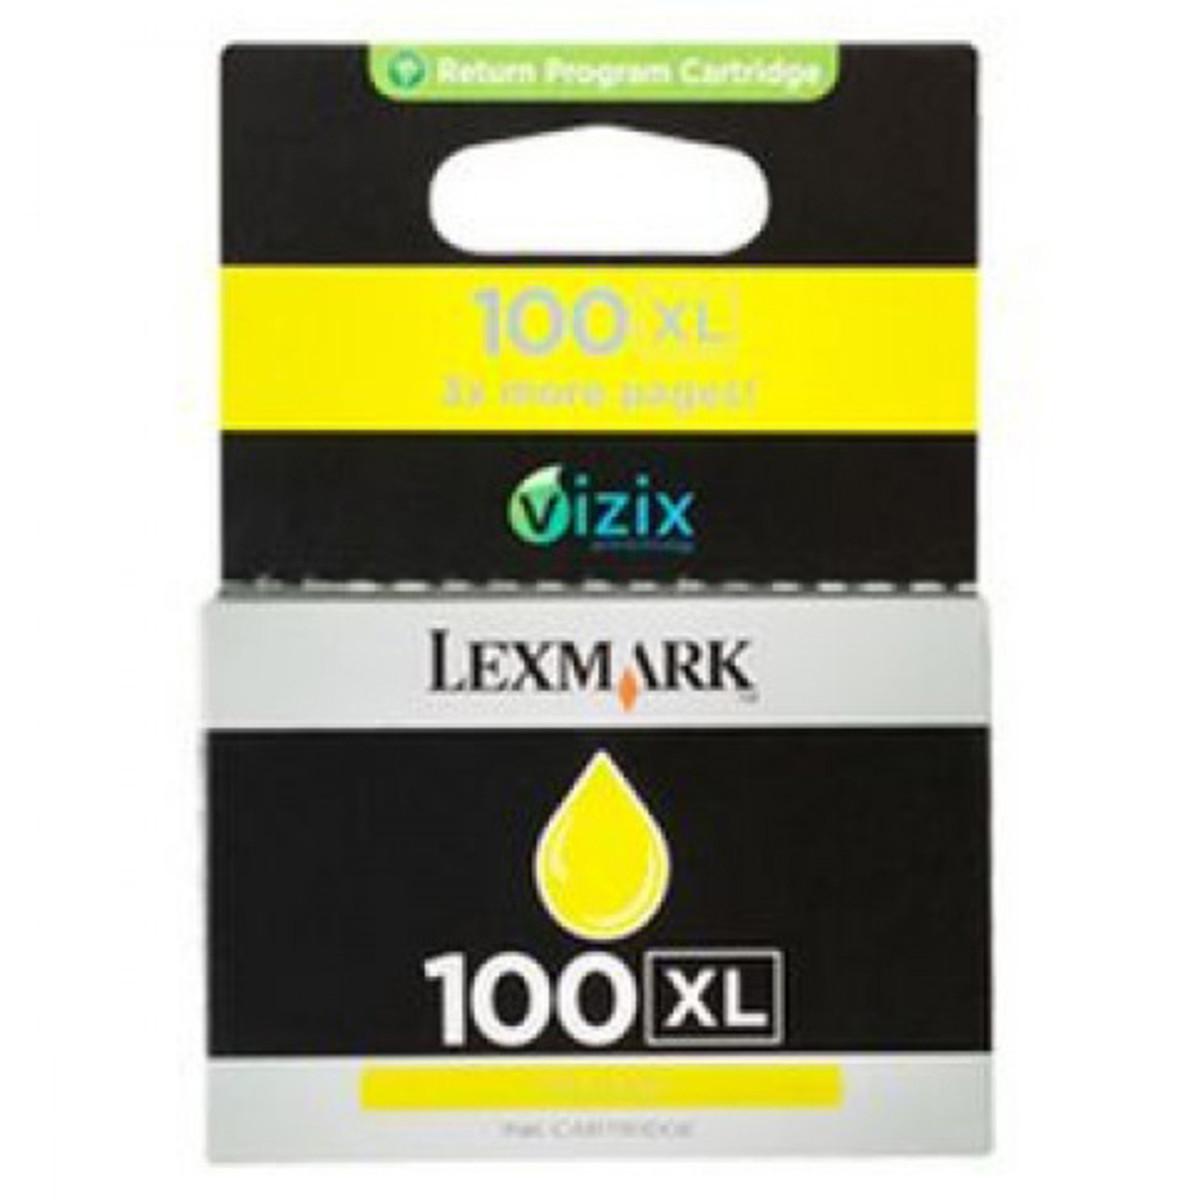 Lexmark 100XL Yellow Ink Cartridge - High Yield